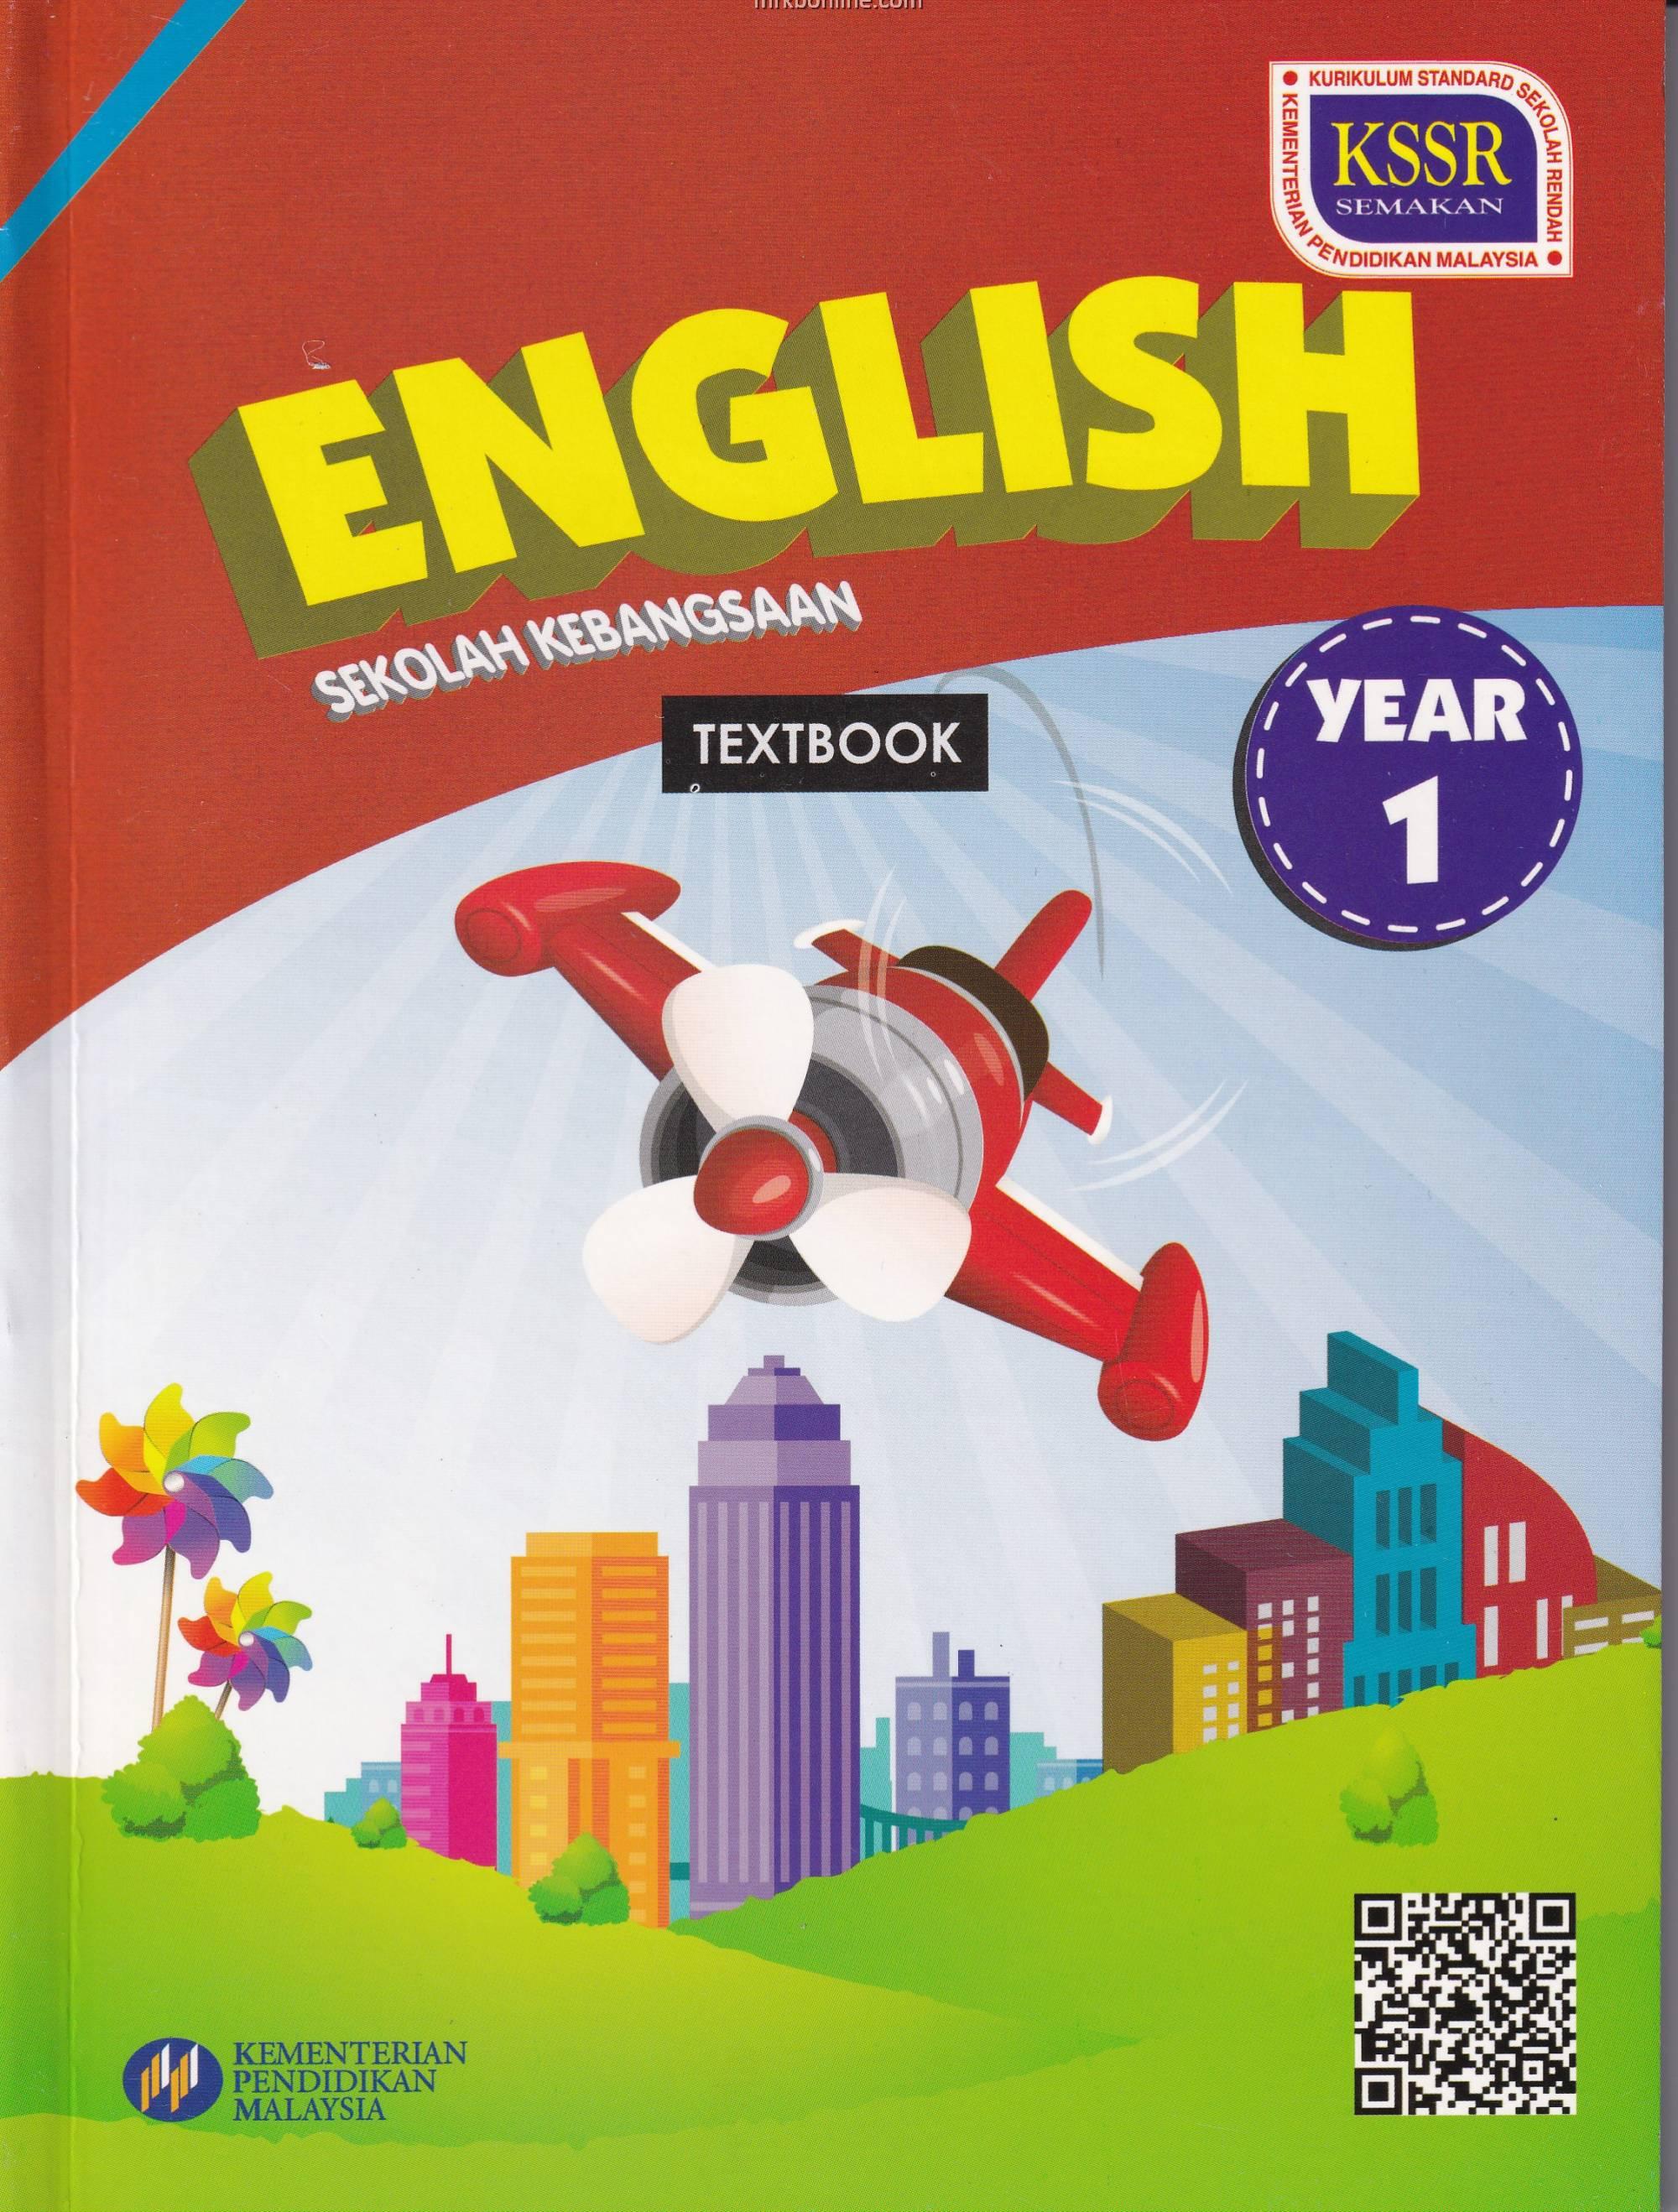 Textbook English Year 1